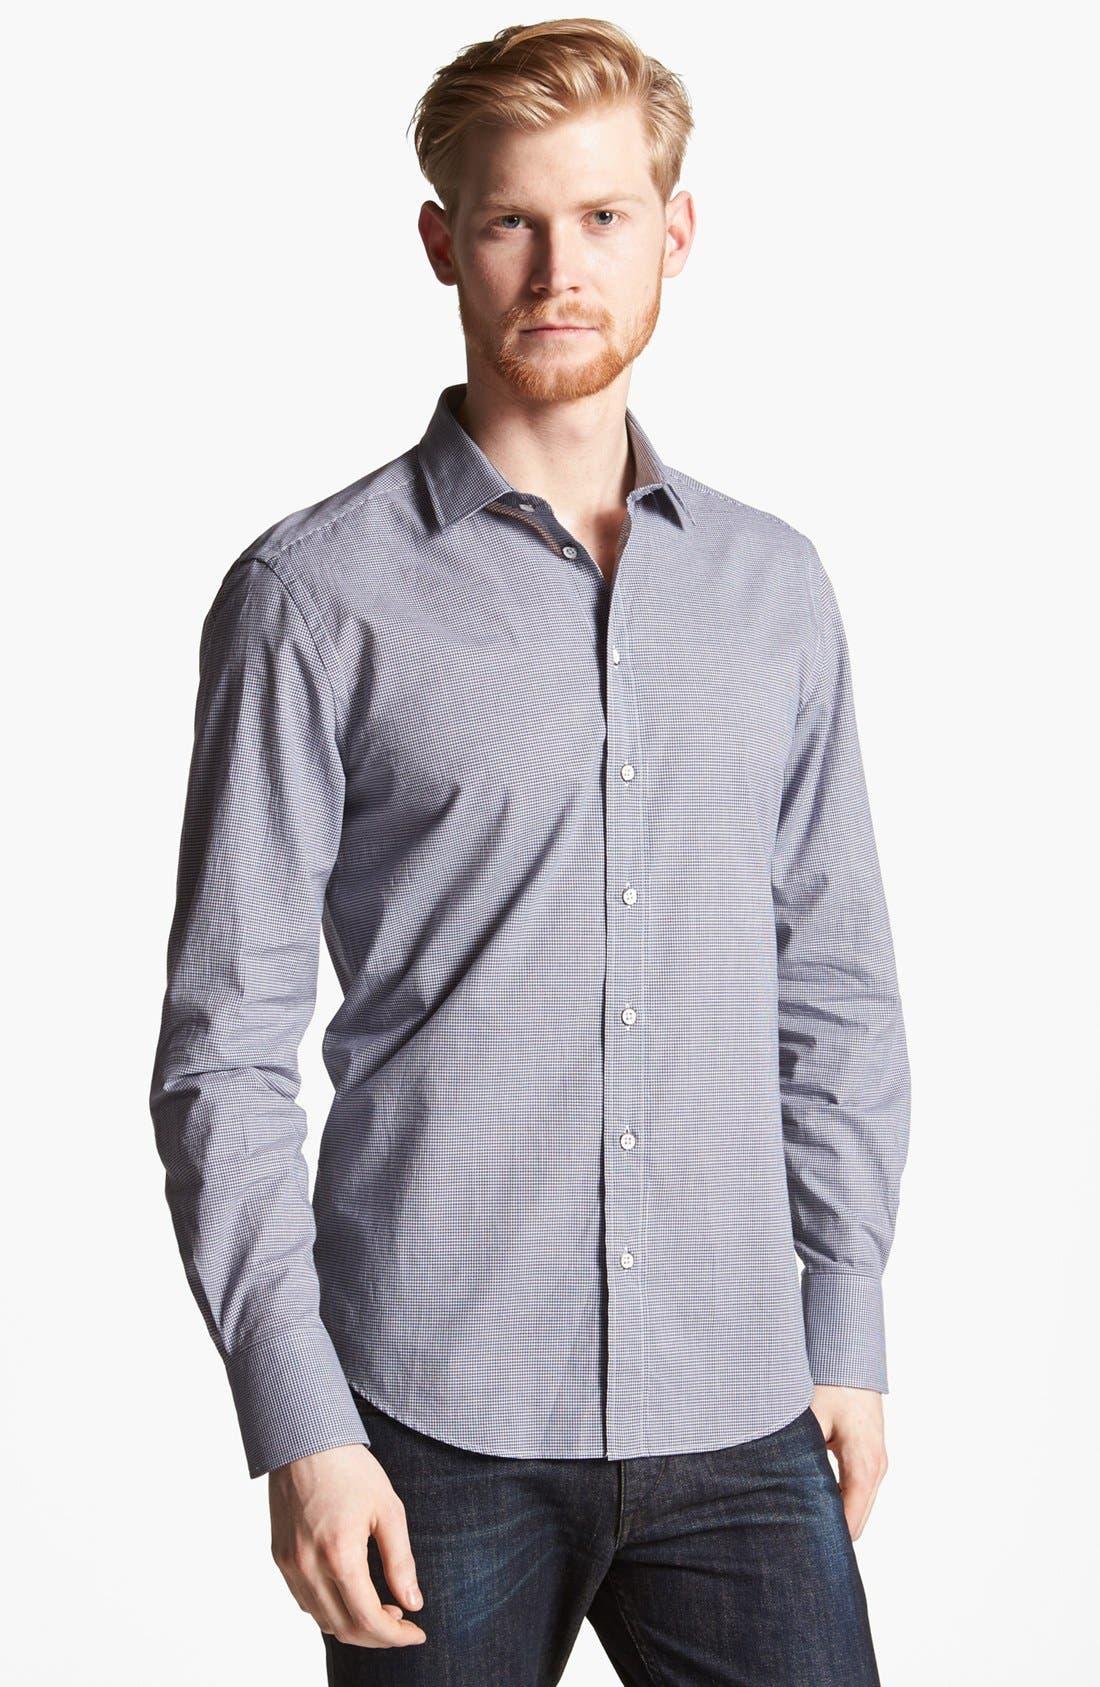 Alternate Image 1 Selected - rag & bone 'Charles' Micro Gingham Woven Shirt